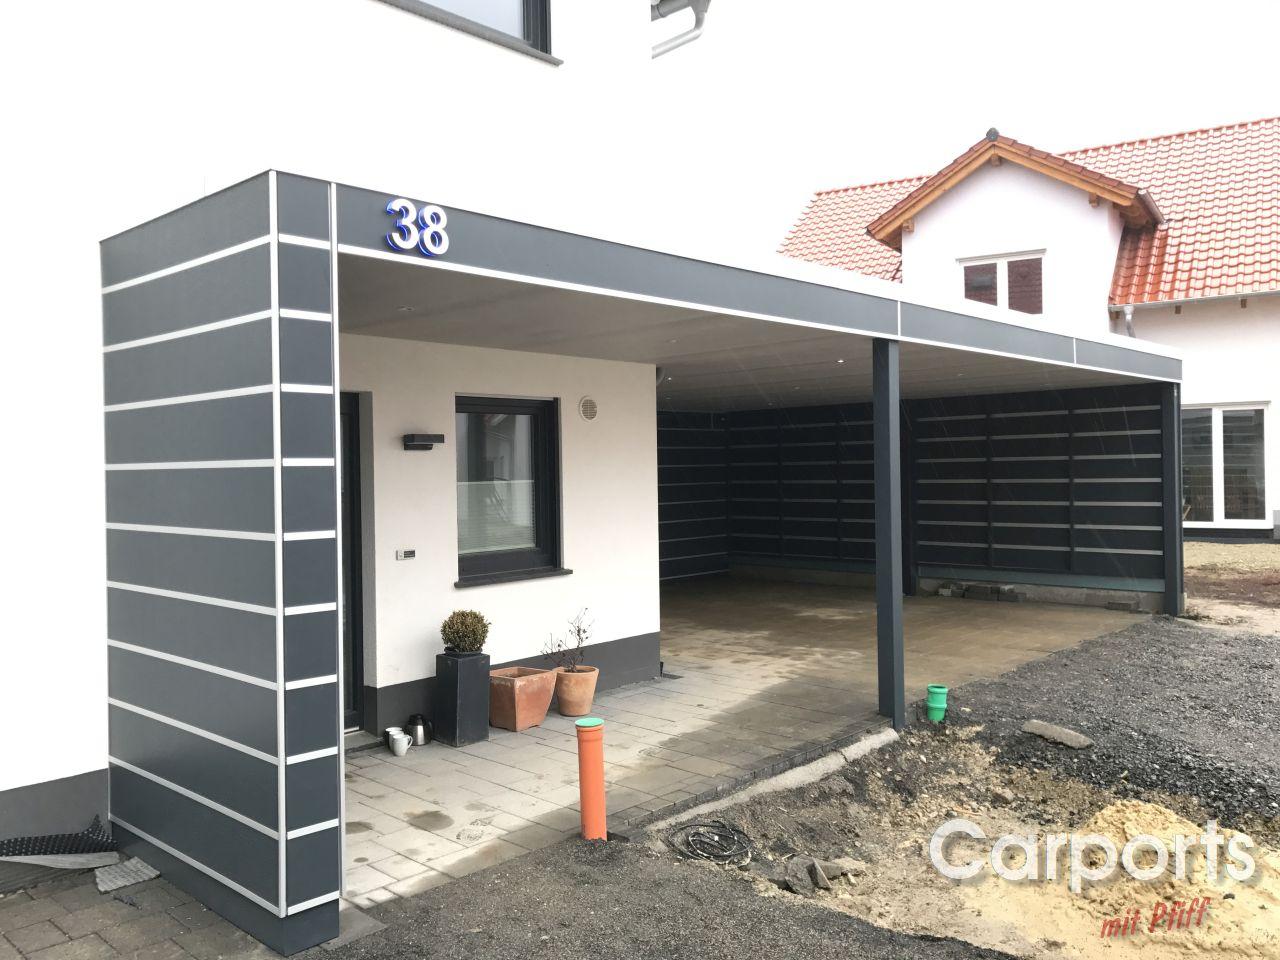 carport bauhaus hpl mit abstellraum und haust r berdachung carports mit pfiff. Black Bedroom Furniture Sets. Home Design Ideas